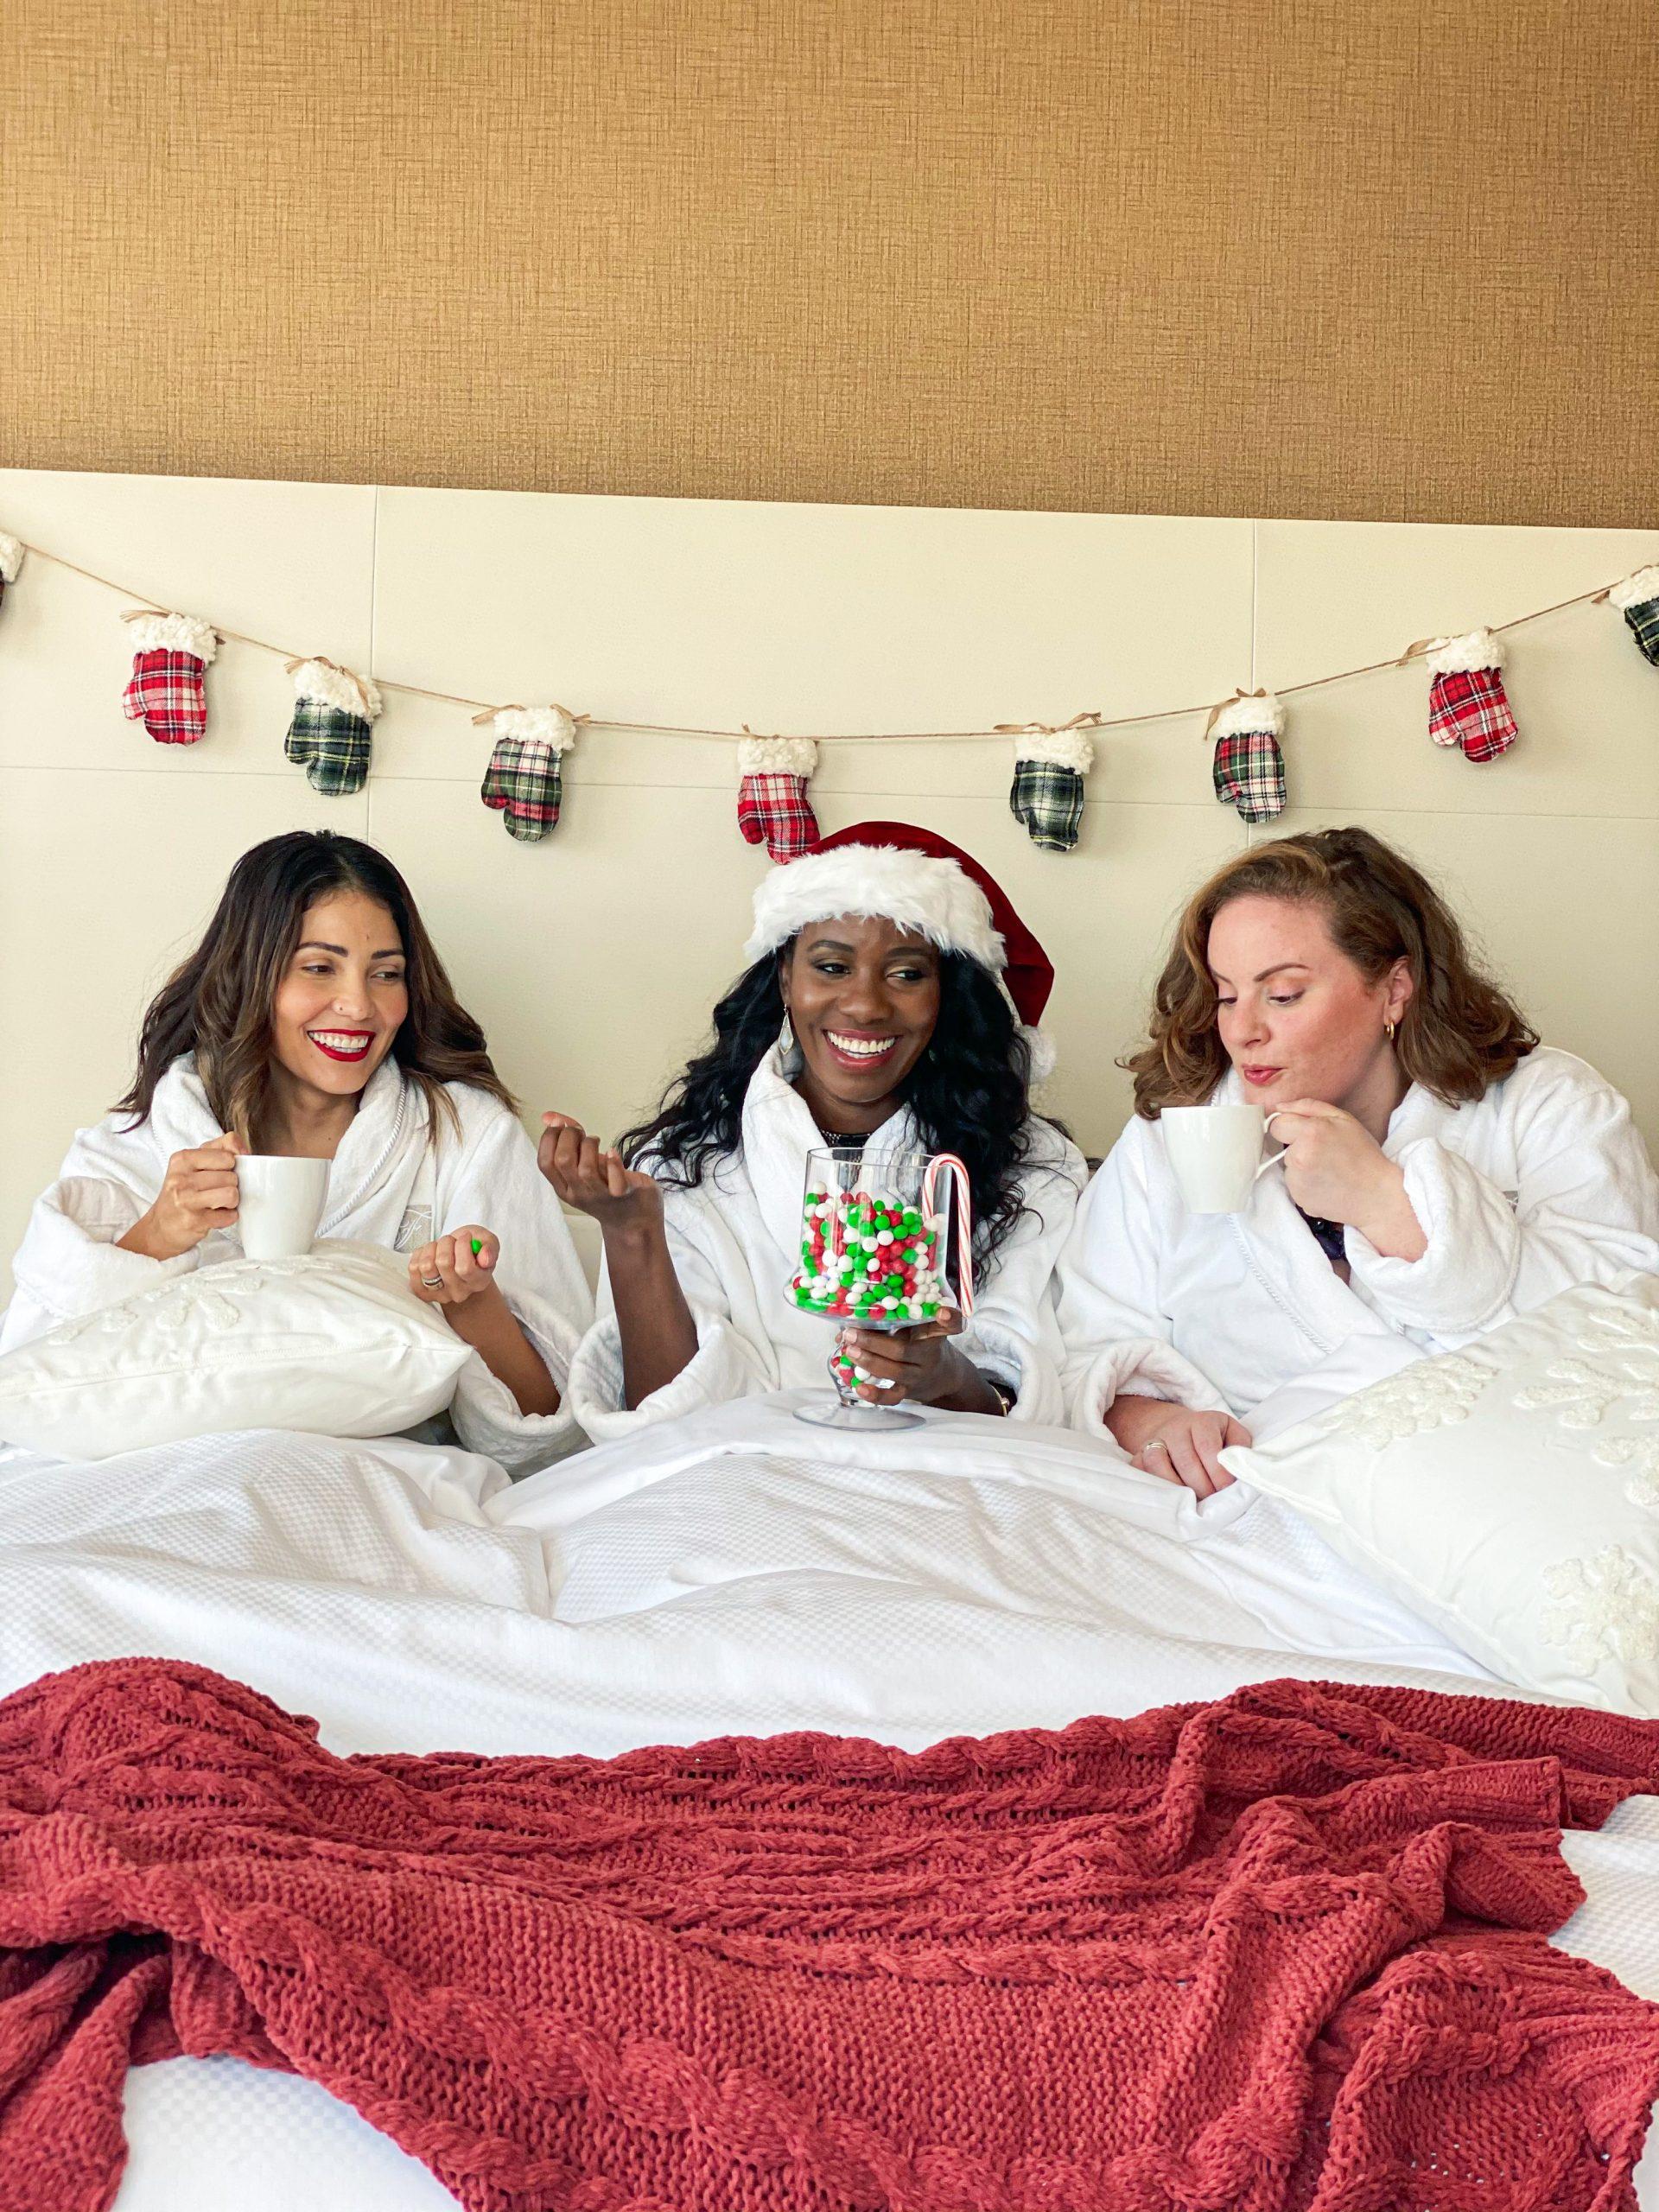 three women in robes enjoying fairmont austin's santa suite